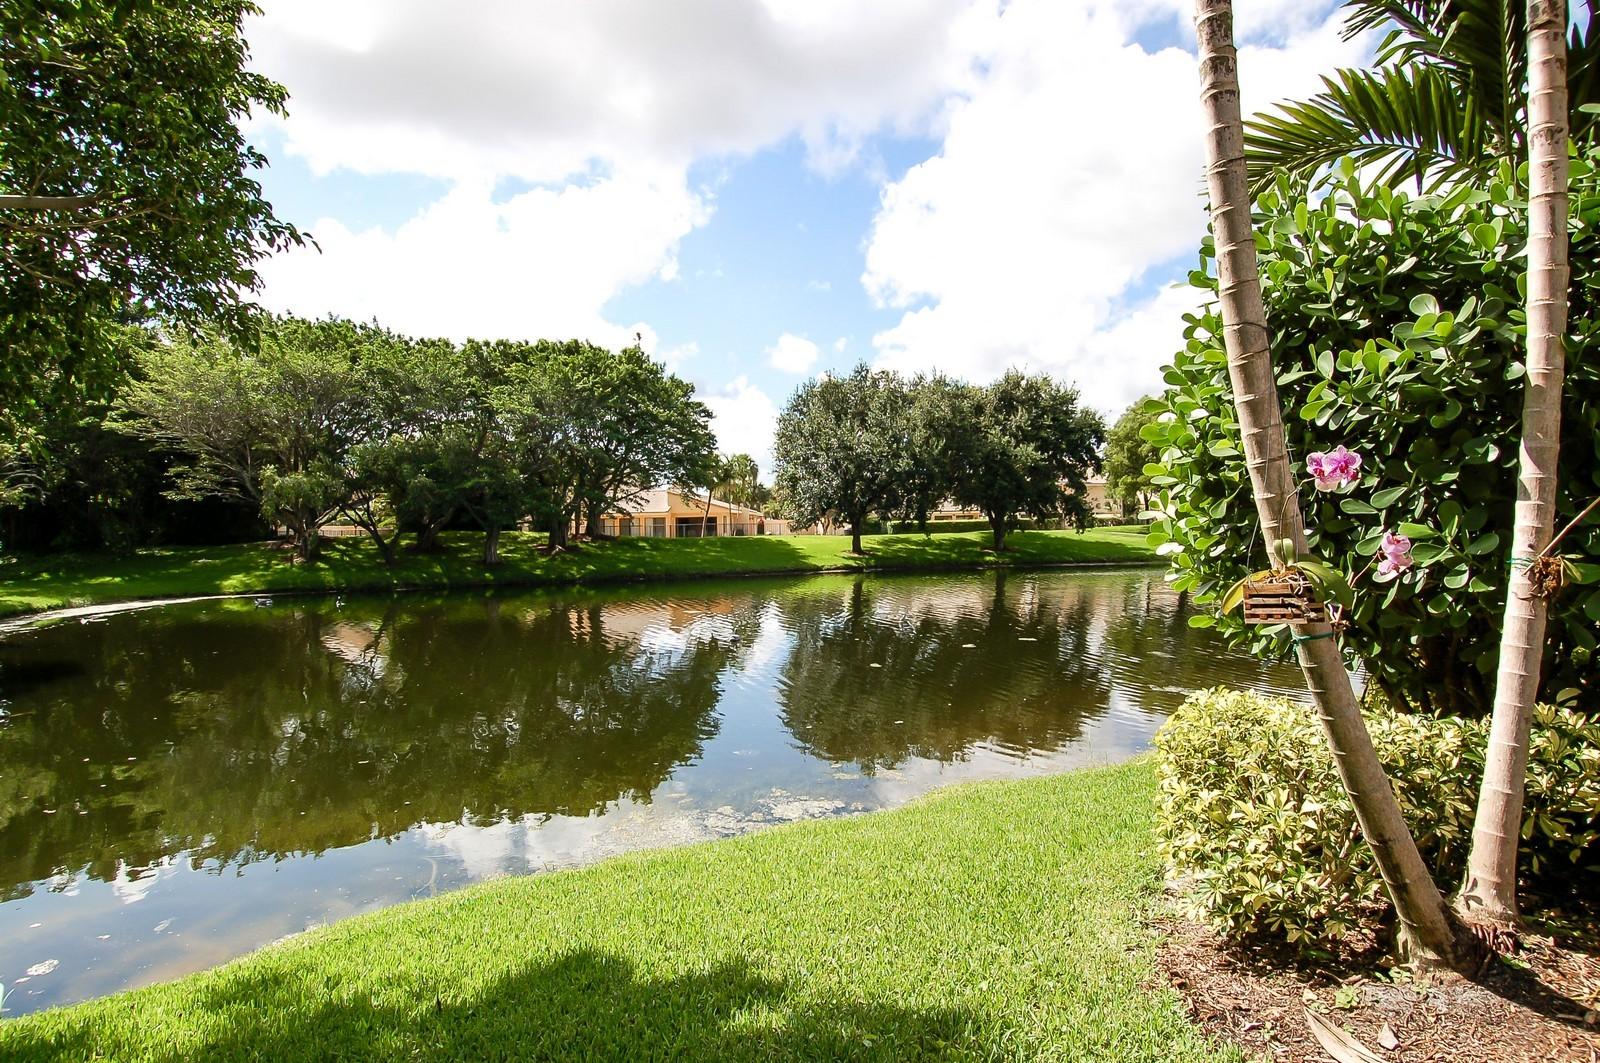 Real Estate Photography - 19674 OakbrookCourt, Boca Raton, FL, 33434 - Lake View